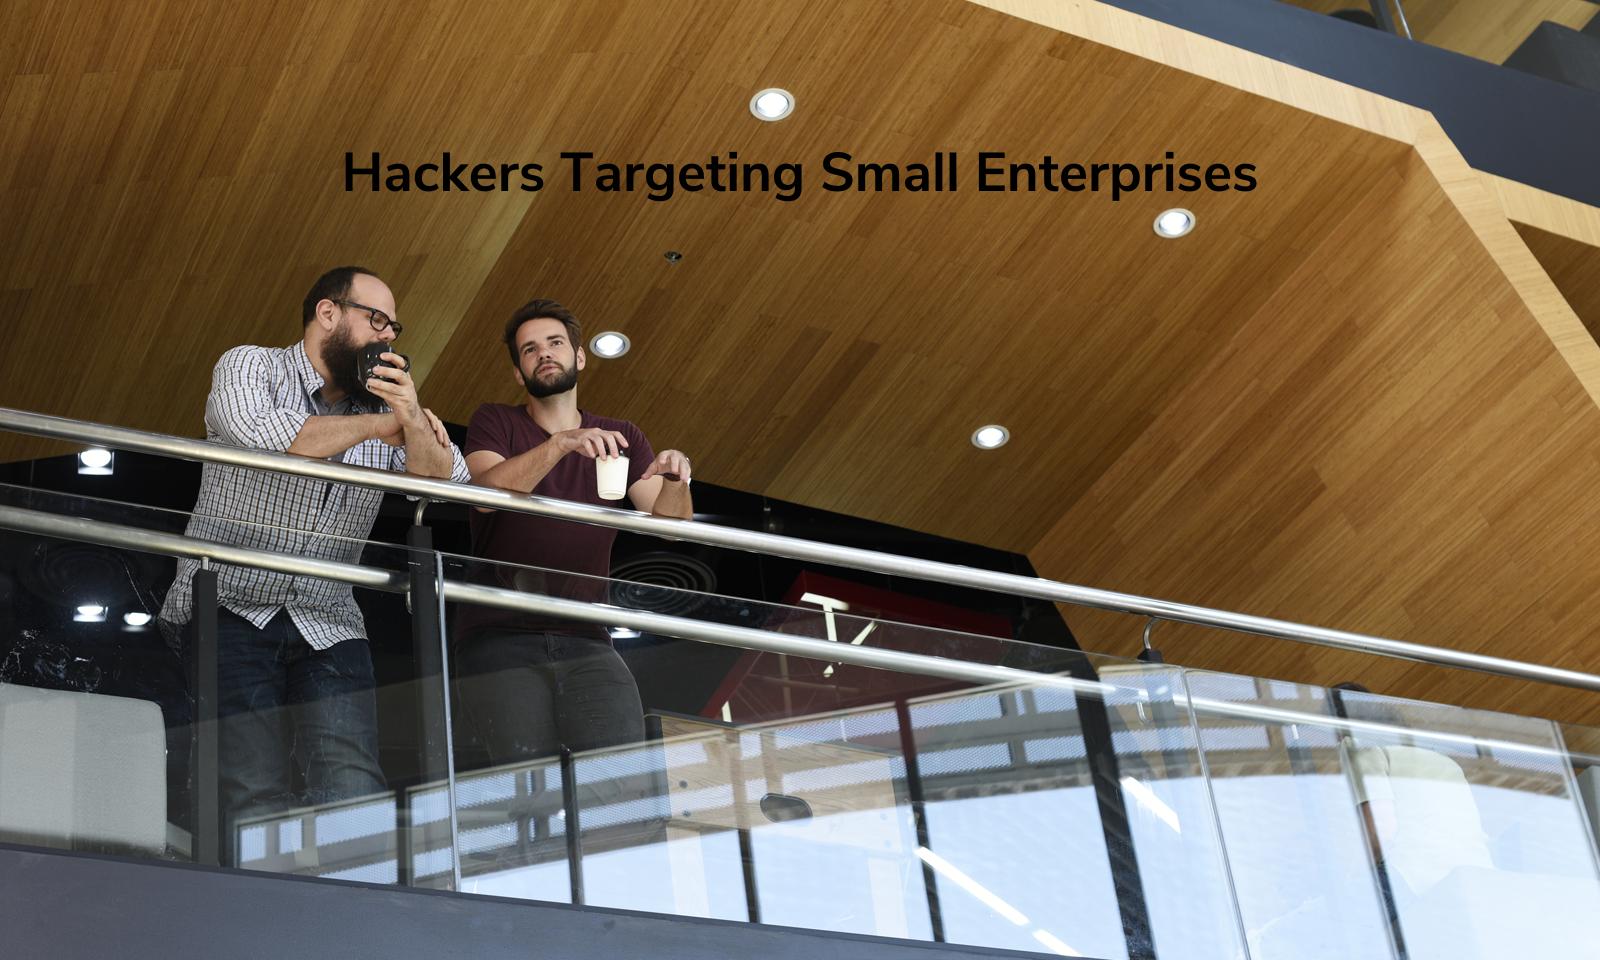 Hackers Targeting Small Enterprises